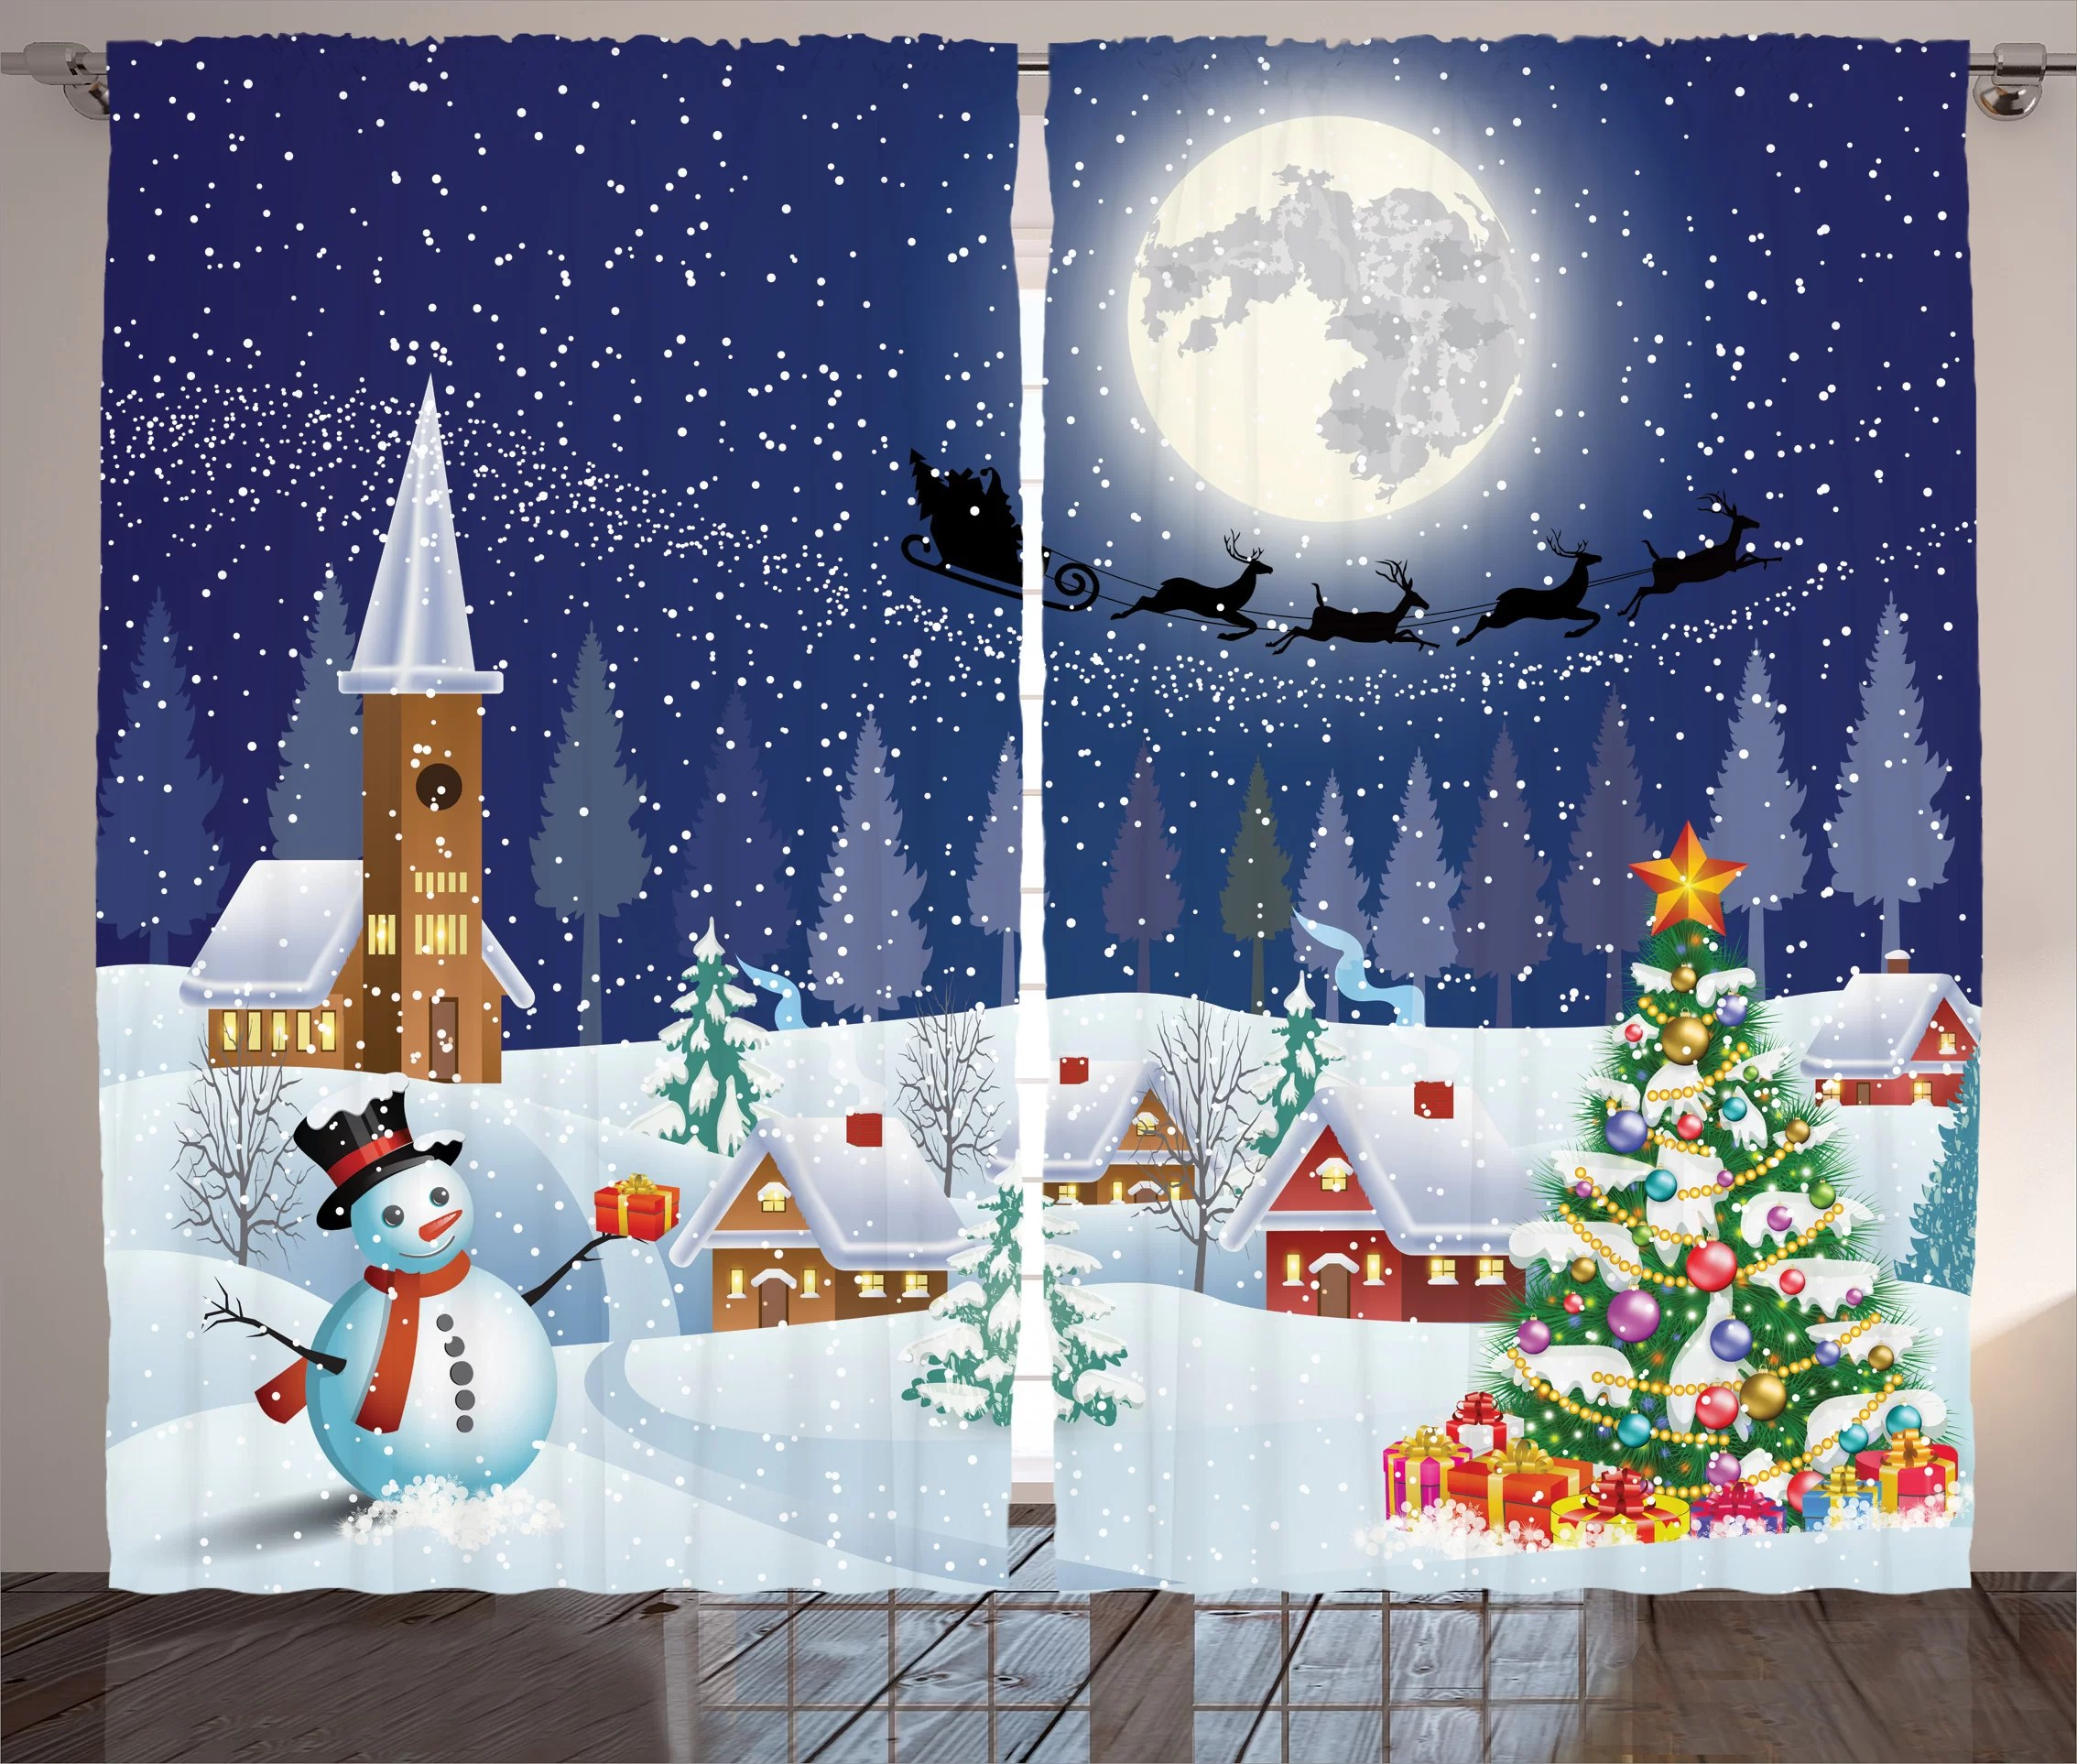 Christmas Decorations Winter Snowman Xmas Tree Santa Sleigh Church Moon Gifts Snow Stars Graphic Print Text Semi Sheer Rod Pocket Curtain Panels